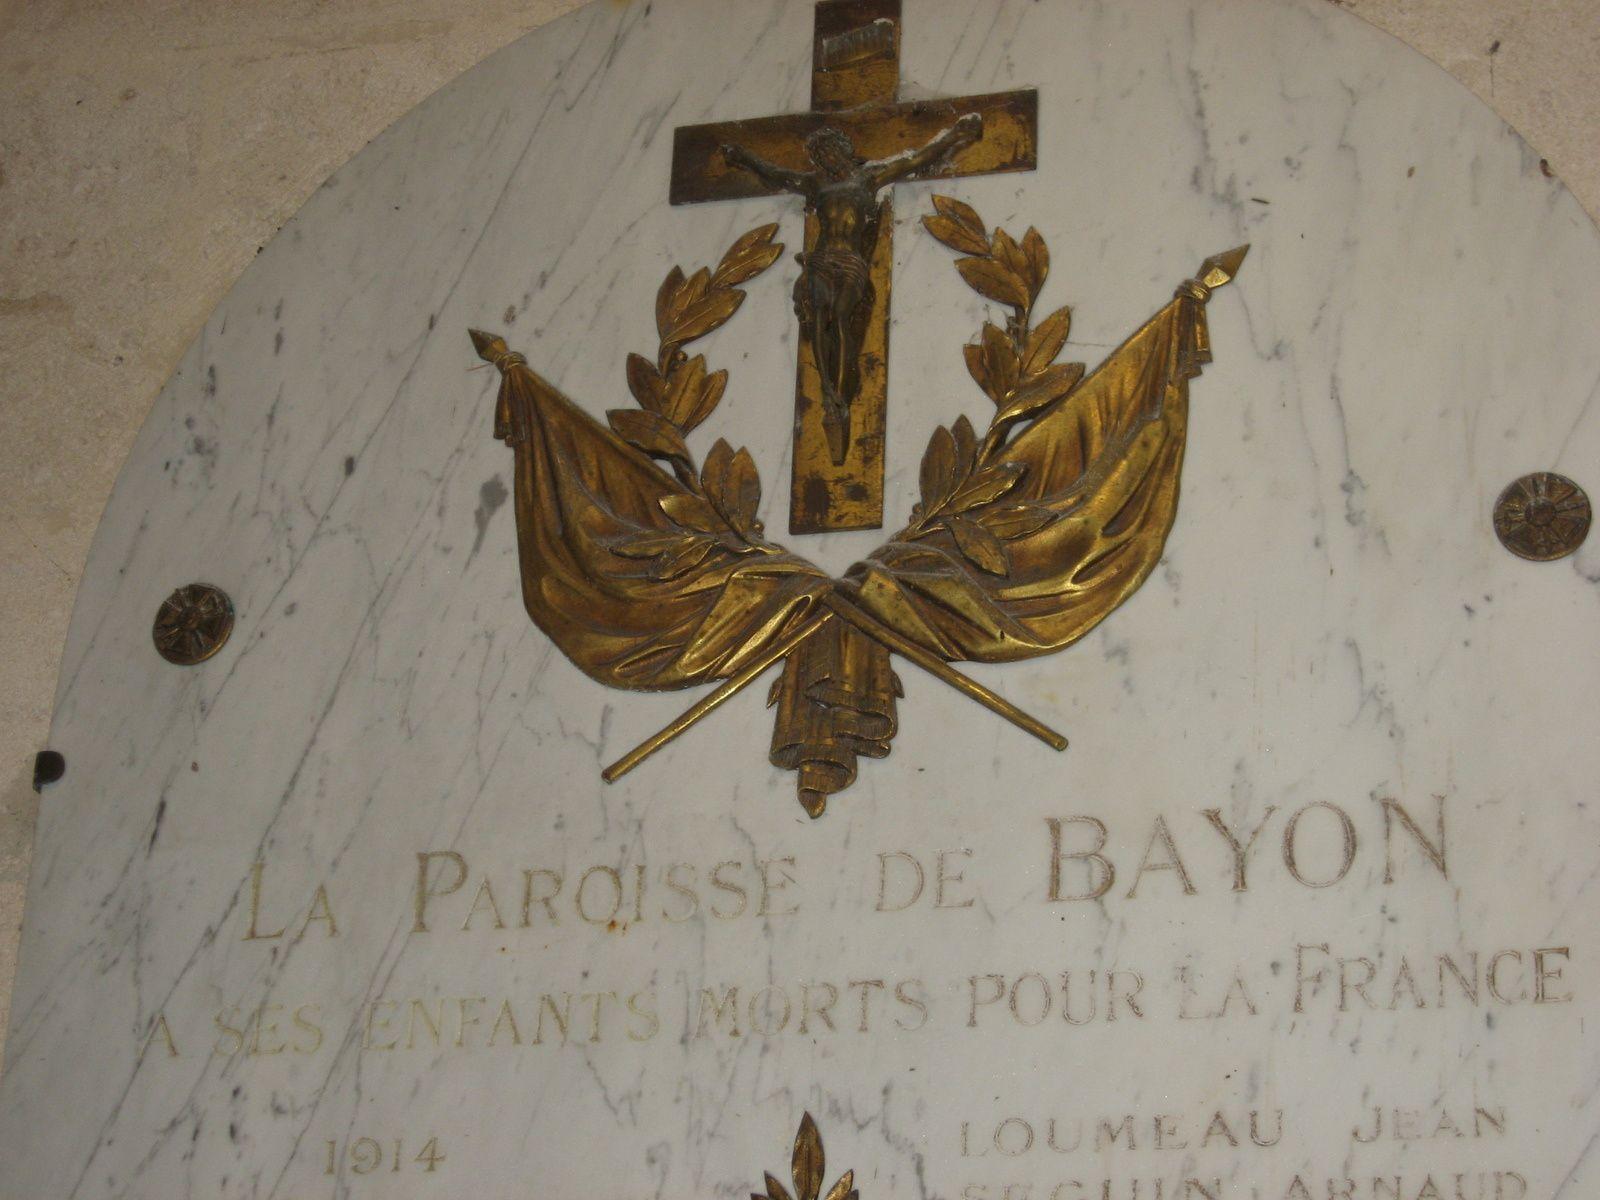 Entre Bourg sur Gironde et Blaye et Eglise de Bayon merveilleusement restaurée